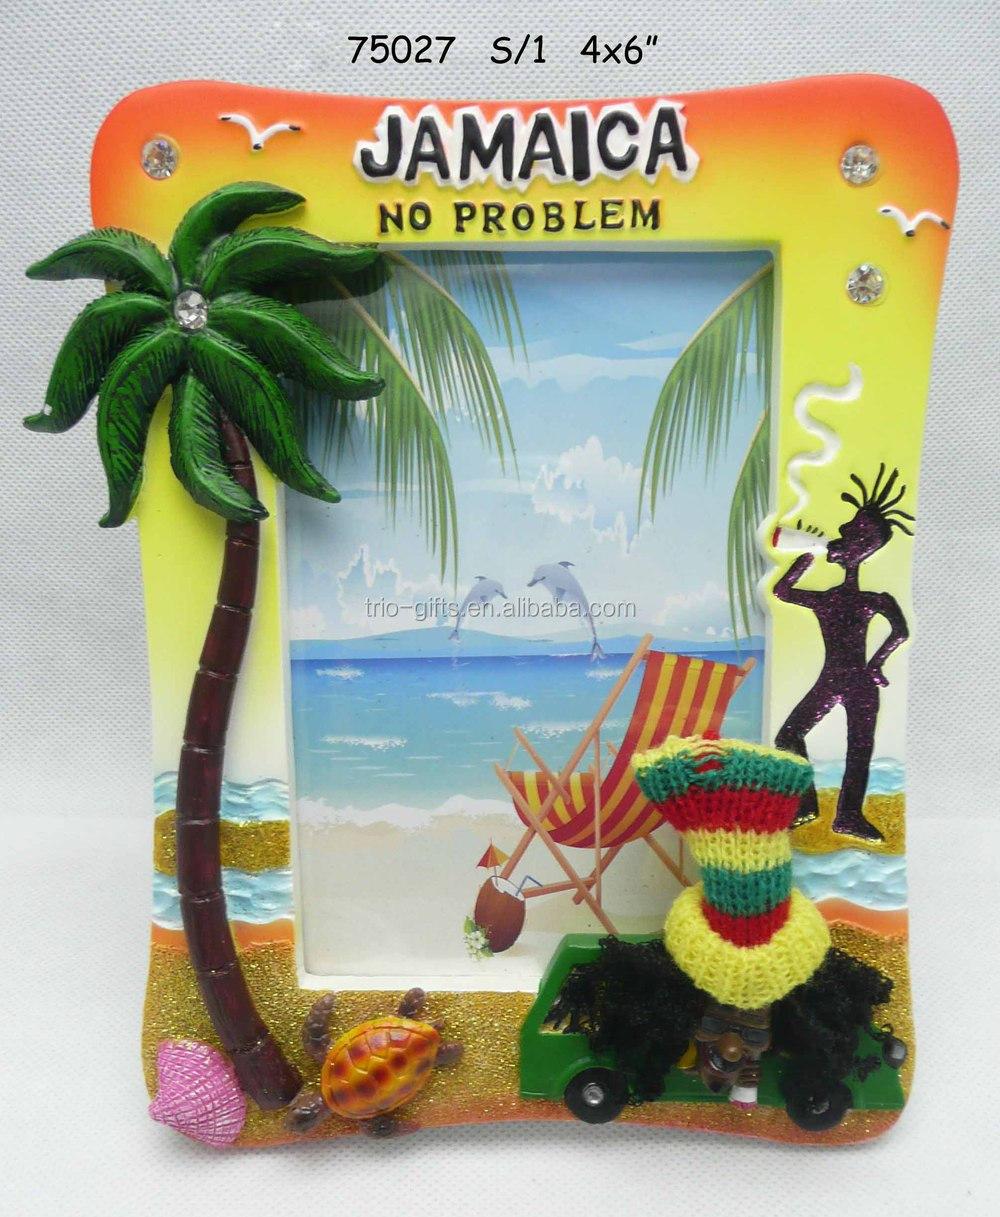 Jamaica Rasta Photo Frames Wholesale With Palm Tree